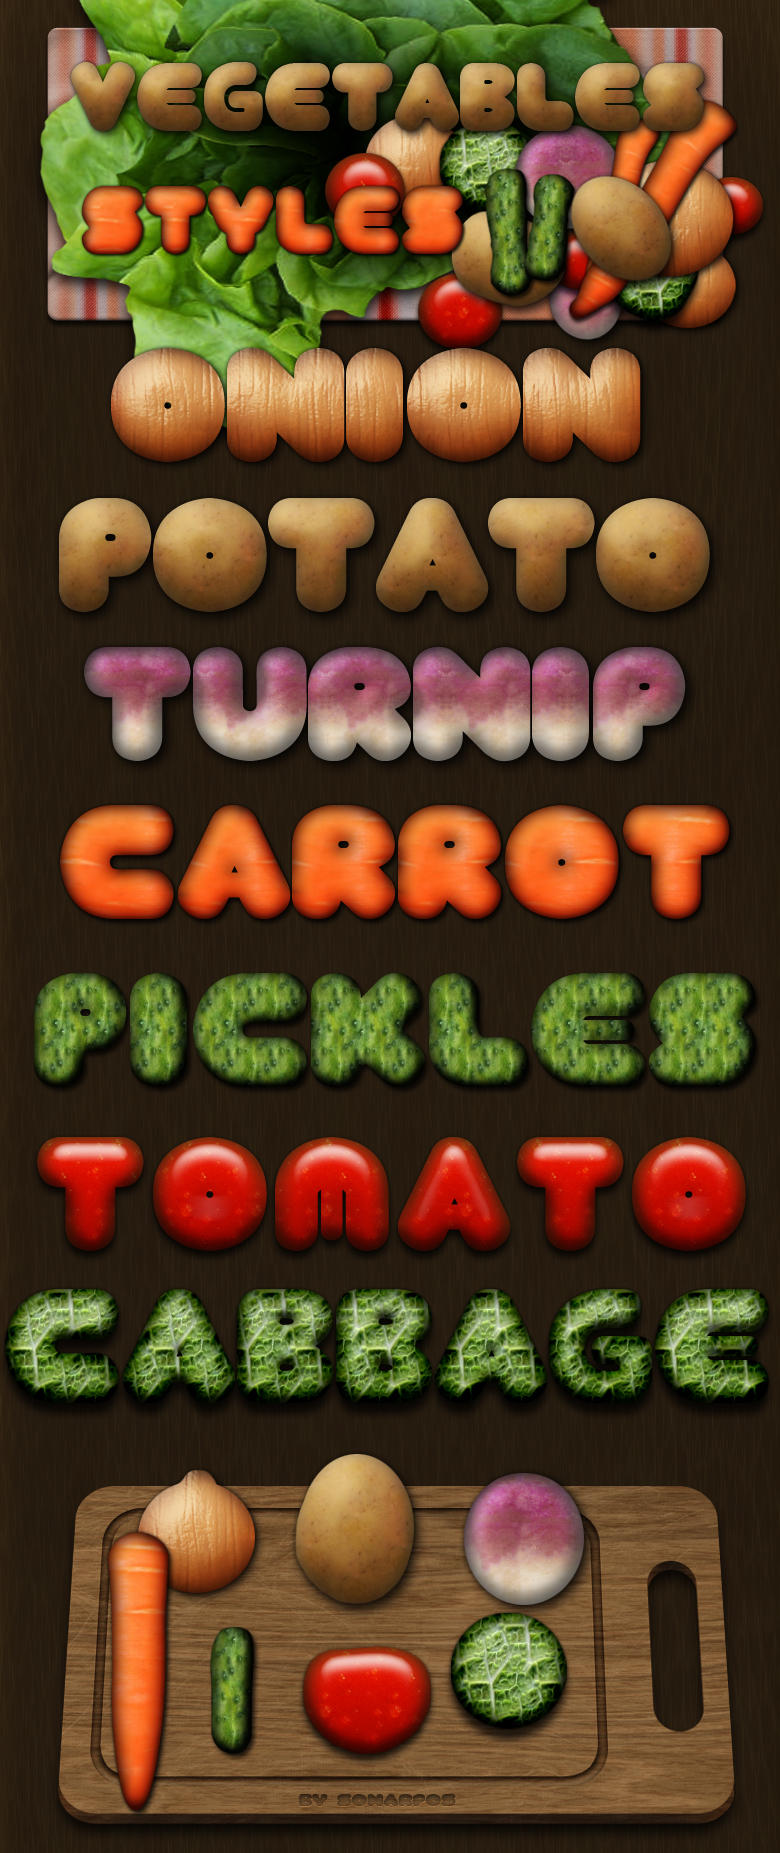 Vegetables styles by sonarpos